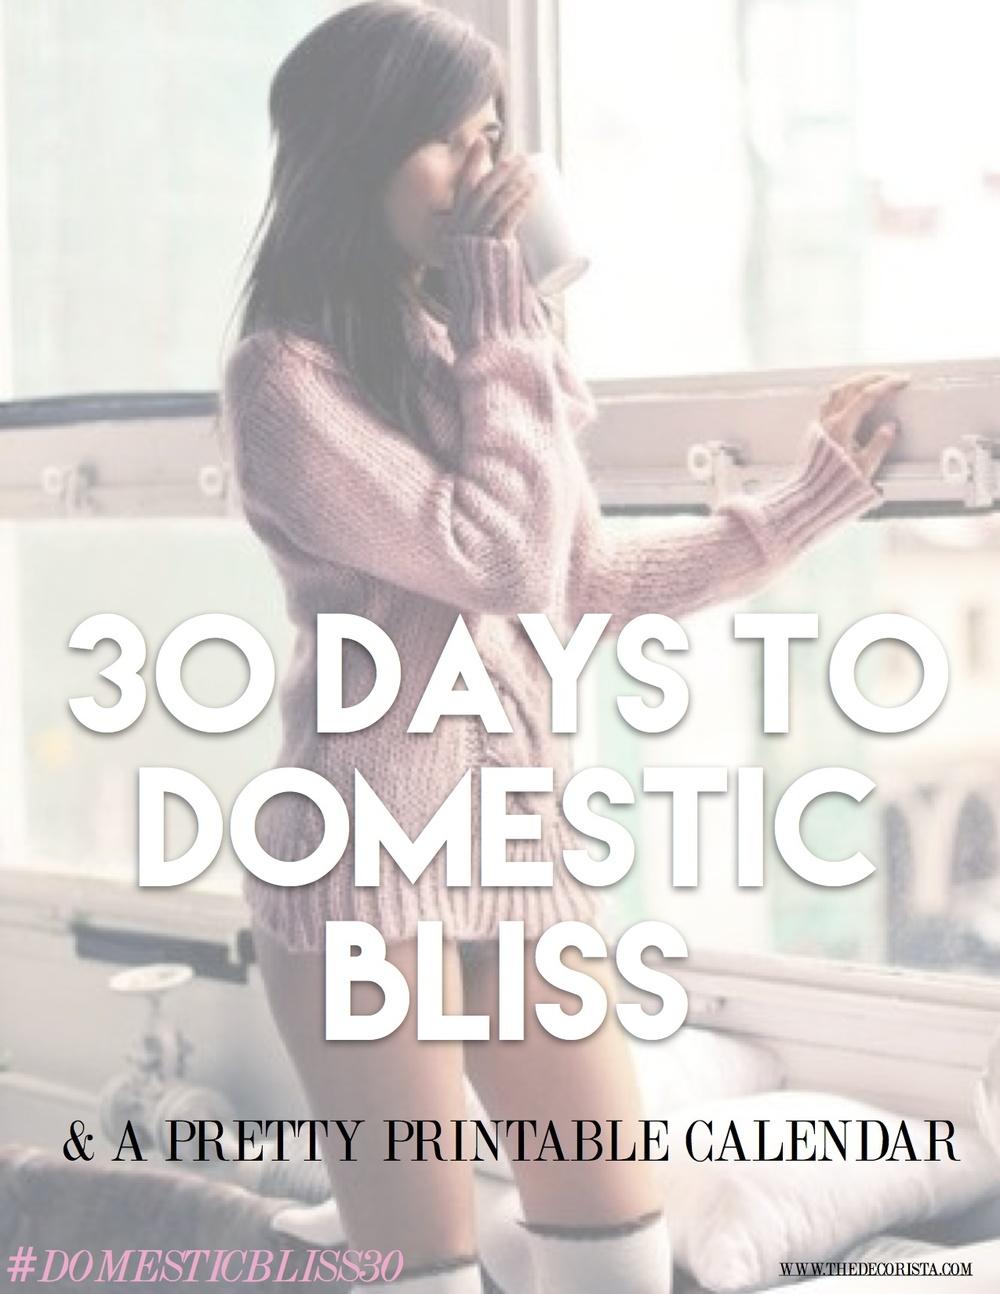 30 days to domestic bliss - the decorista